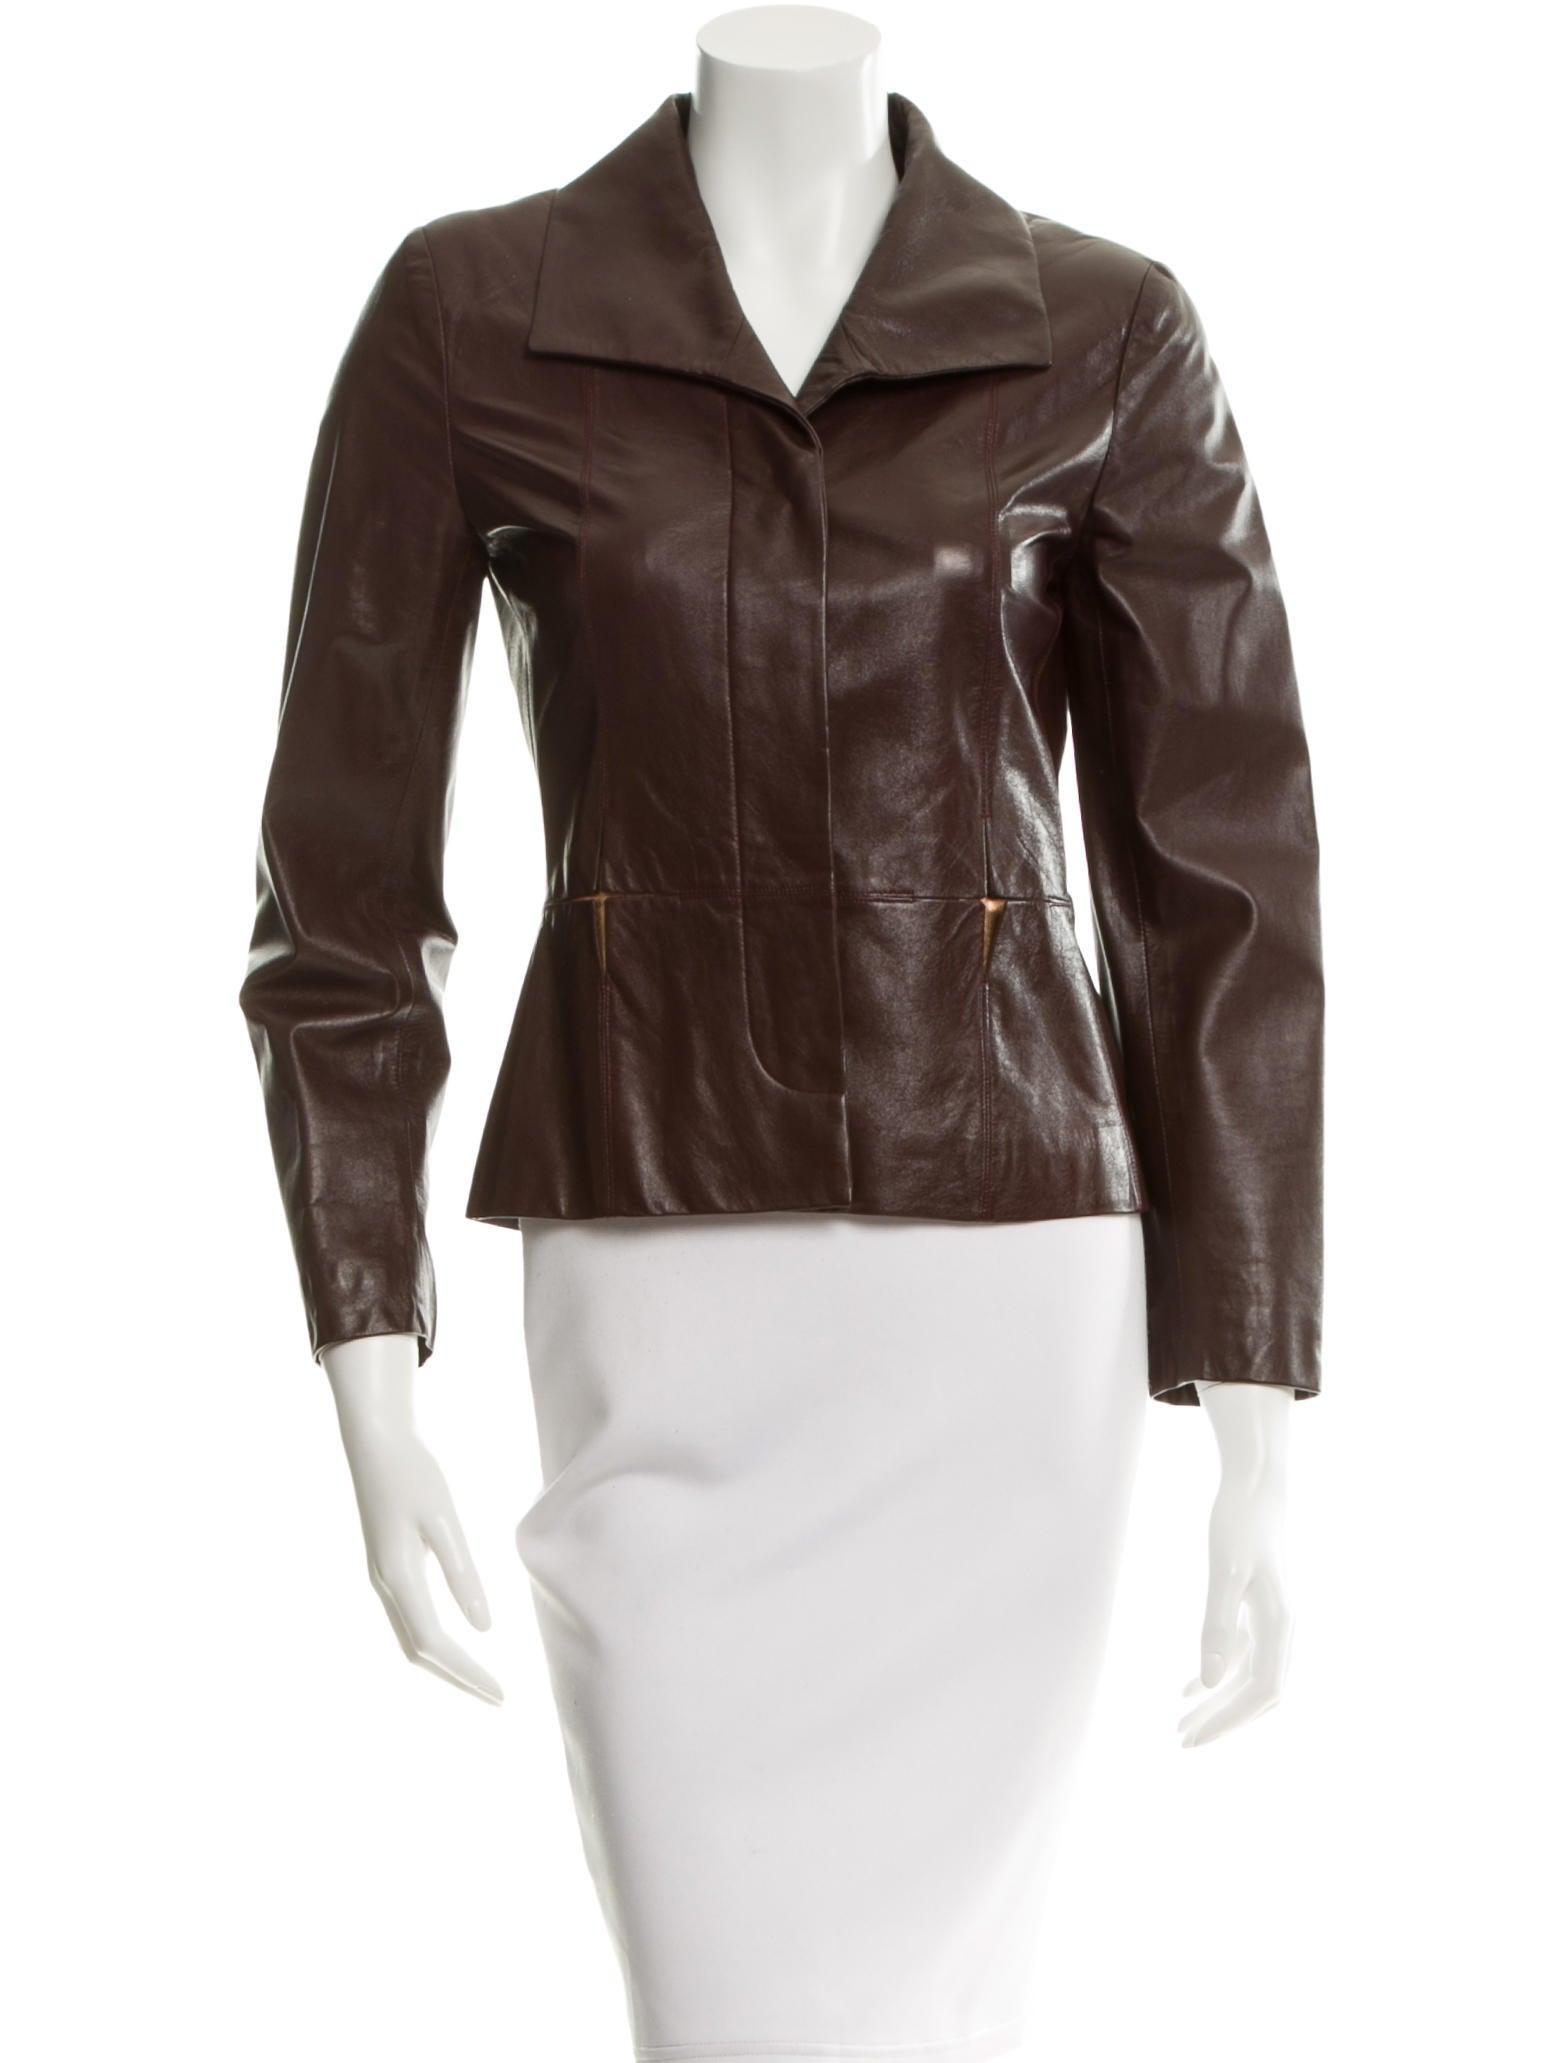 Chanel leather jacket